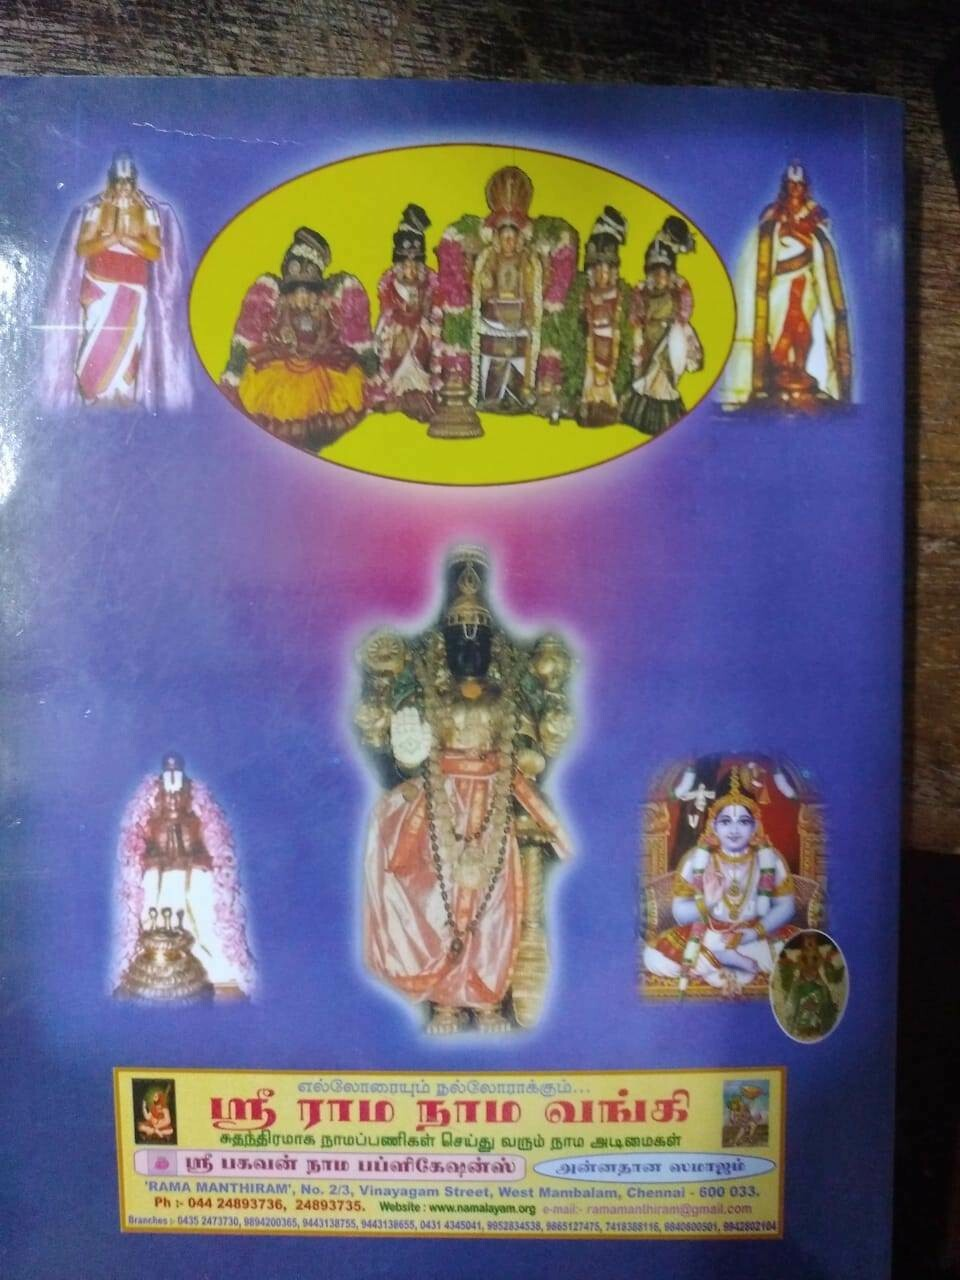 108 Sri Vaishnava Divyadesa pasurams from Nalayira Divya Prabandham, 108  ஸ்ரீவைஷ்ணவ திவ்யதேசங்களும் அவற்றிற்கான நாலாயிர திவ்யப்ரபந்தப் பாசுரங்களும்